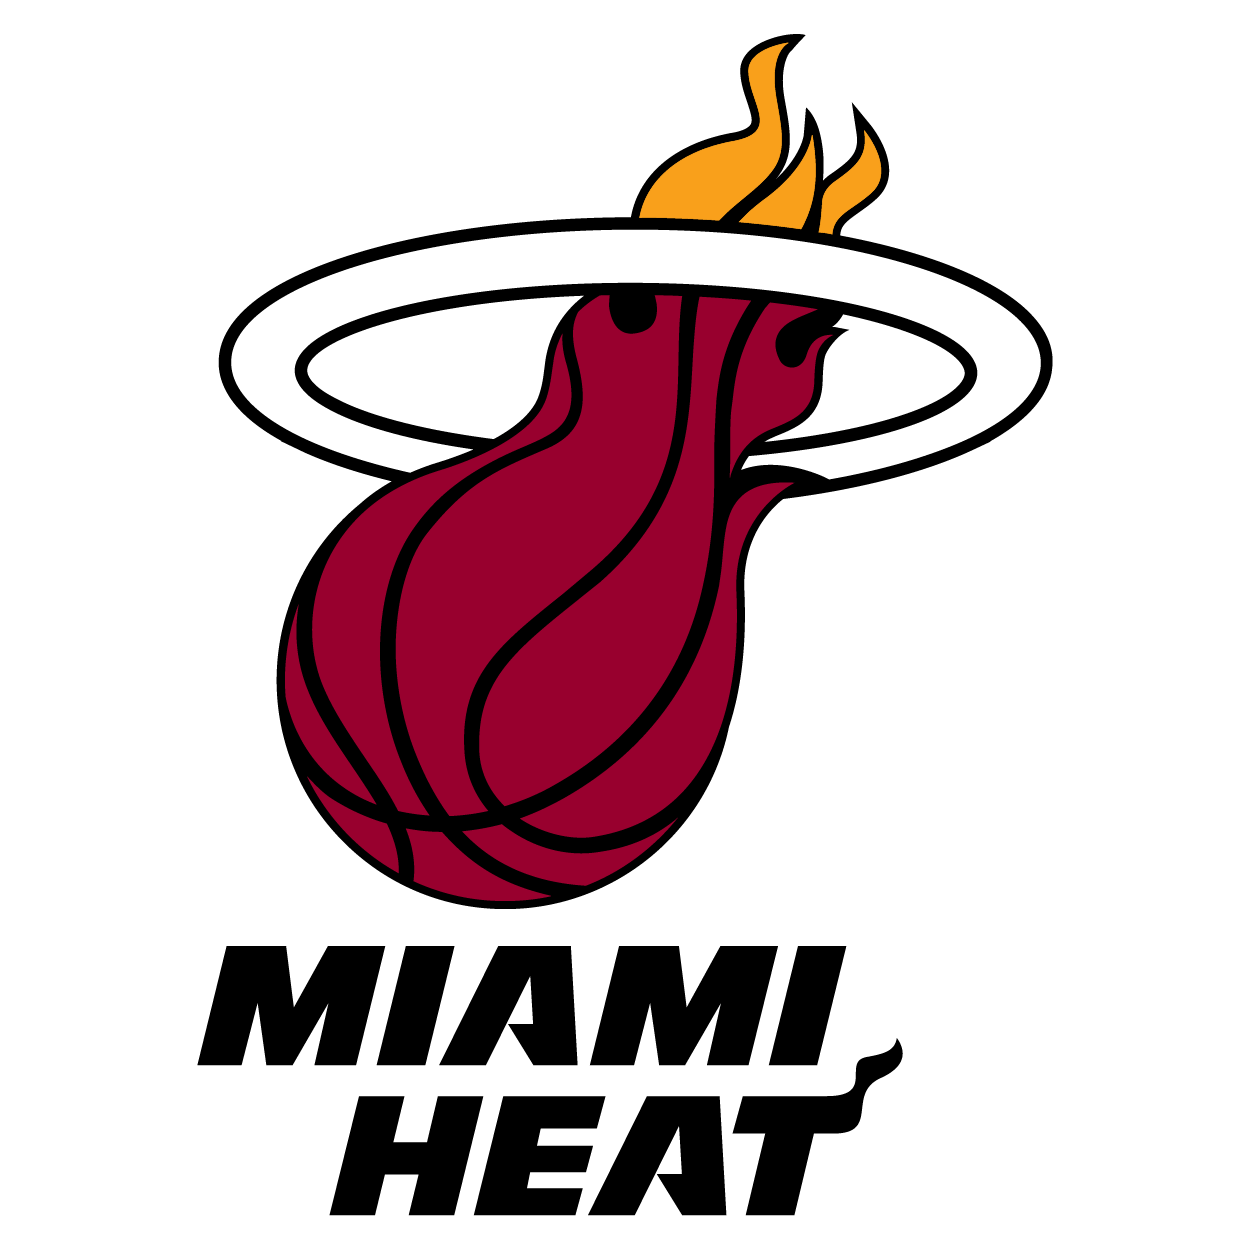 Miami Heat Logo (NBA) png